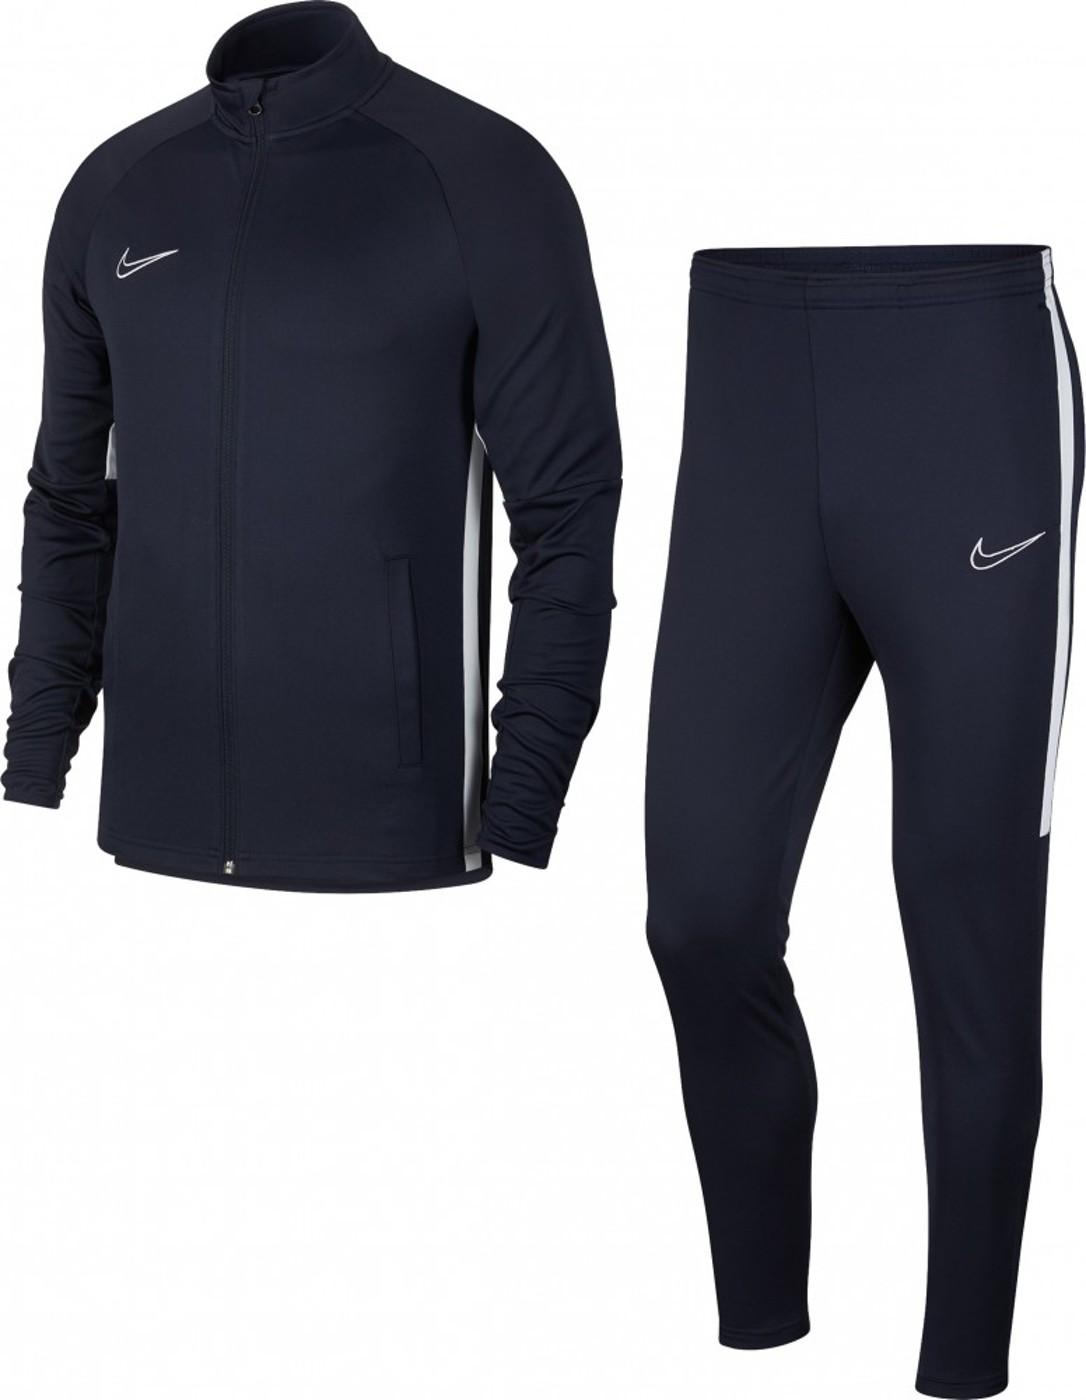 Nike Dri-FIT Academy Soc - Herren